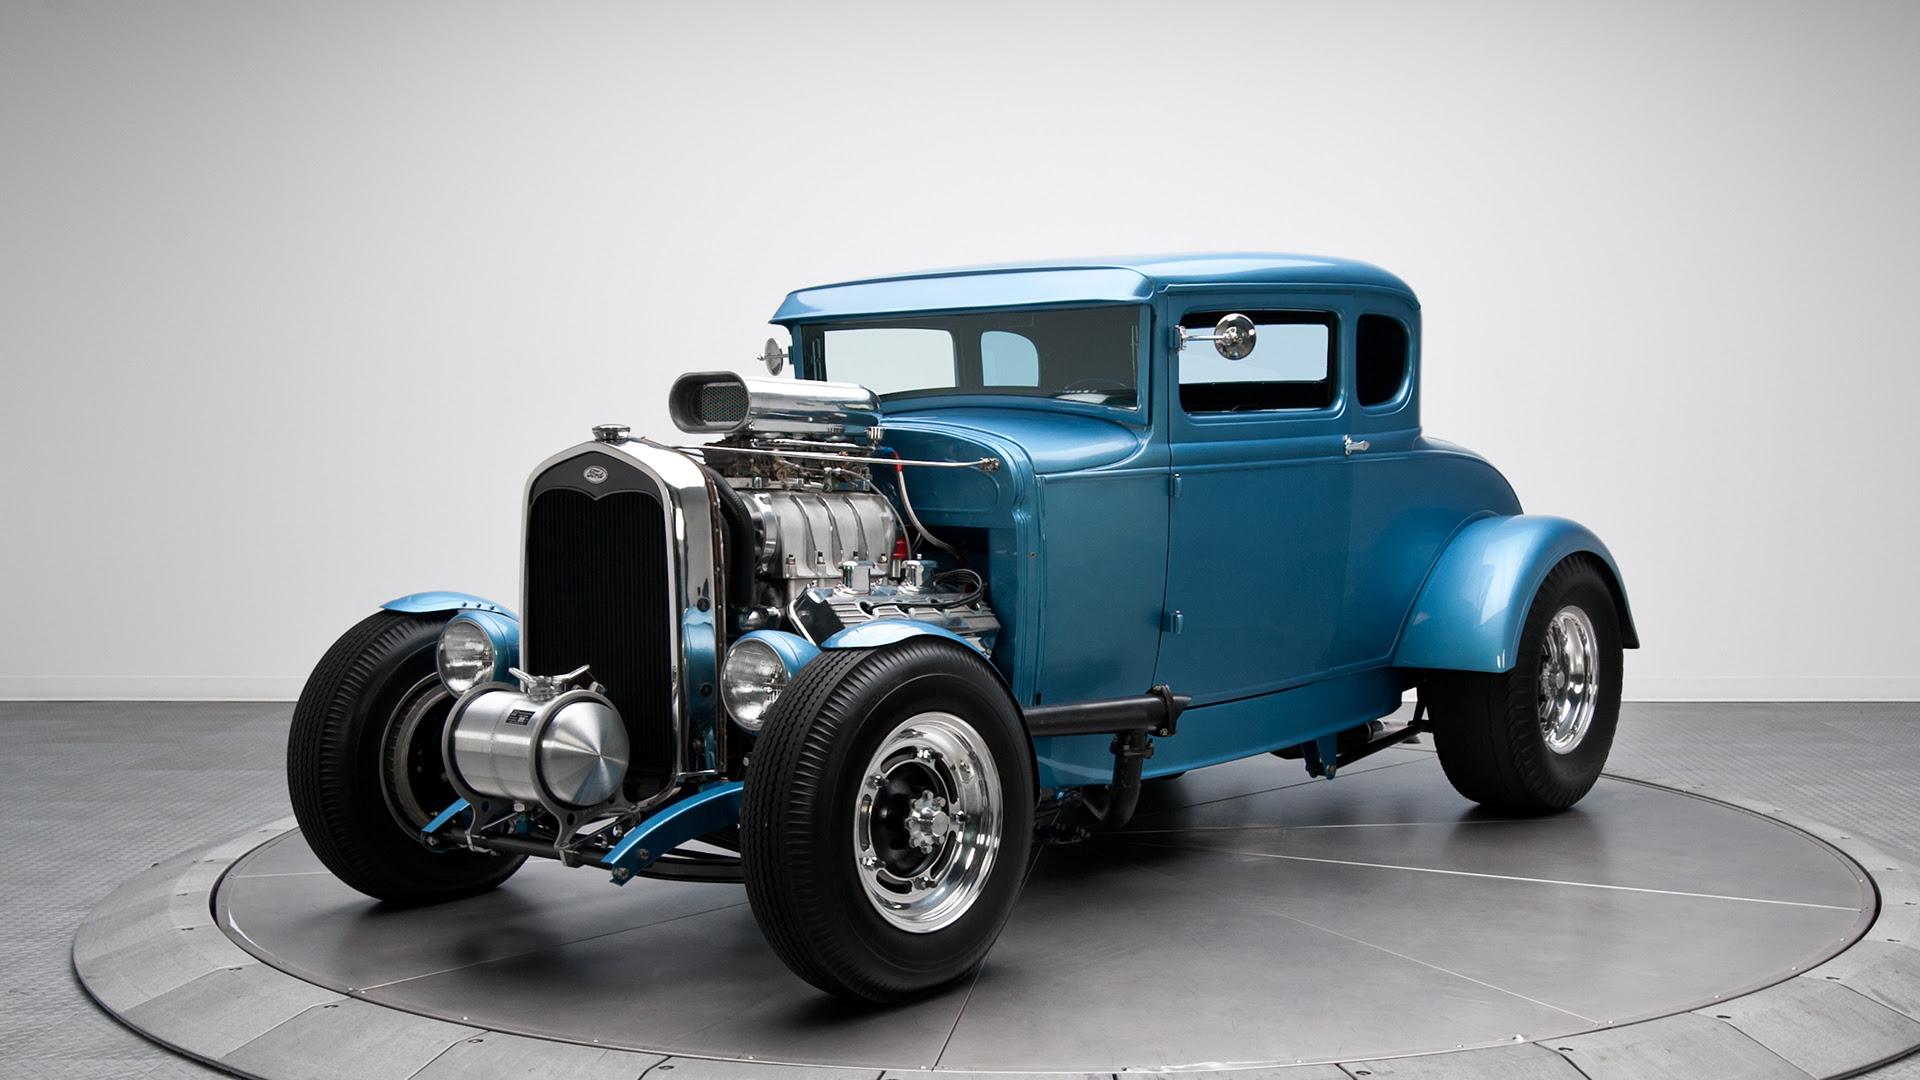 Classic Car Classic Hot Rod Engine Ford HD wallpaper  cars  Wallpaper Better